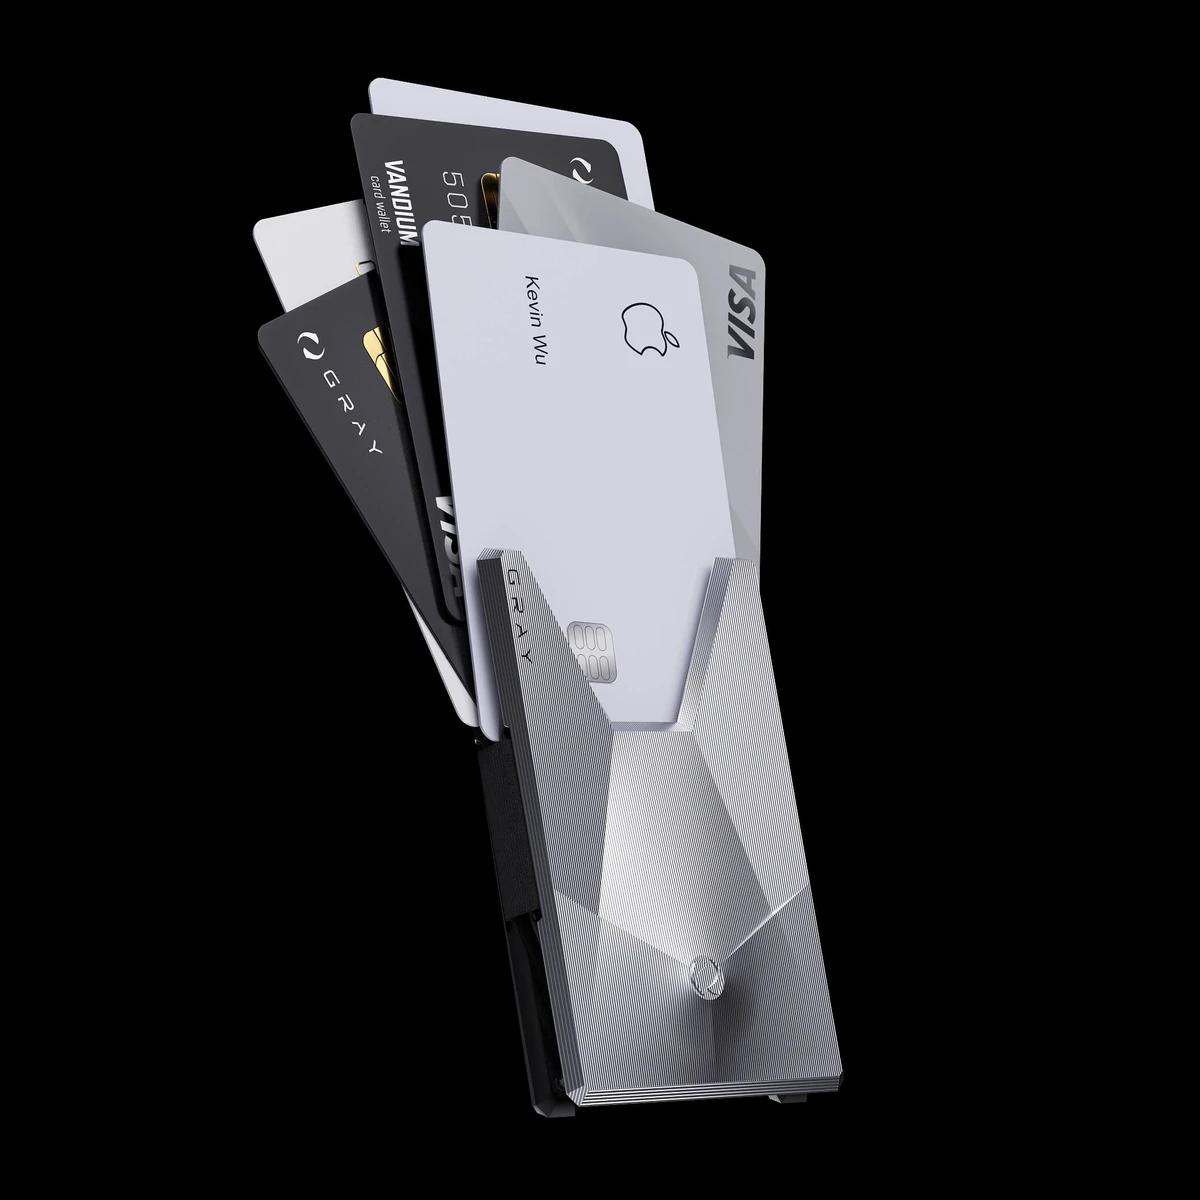 vandium luxury titanium metal card wallet